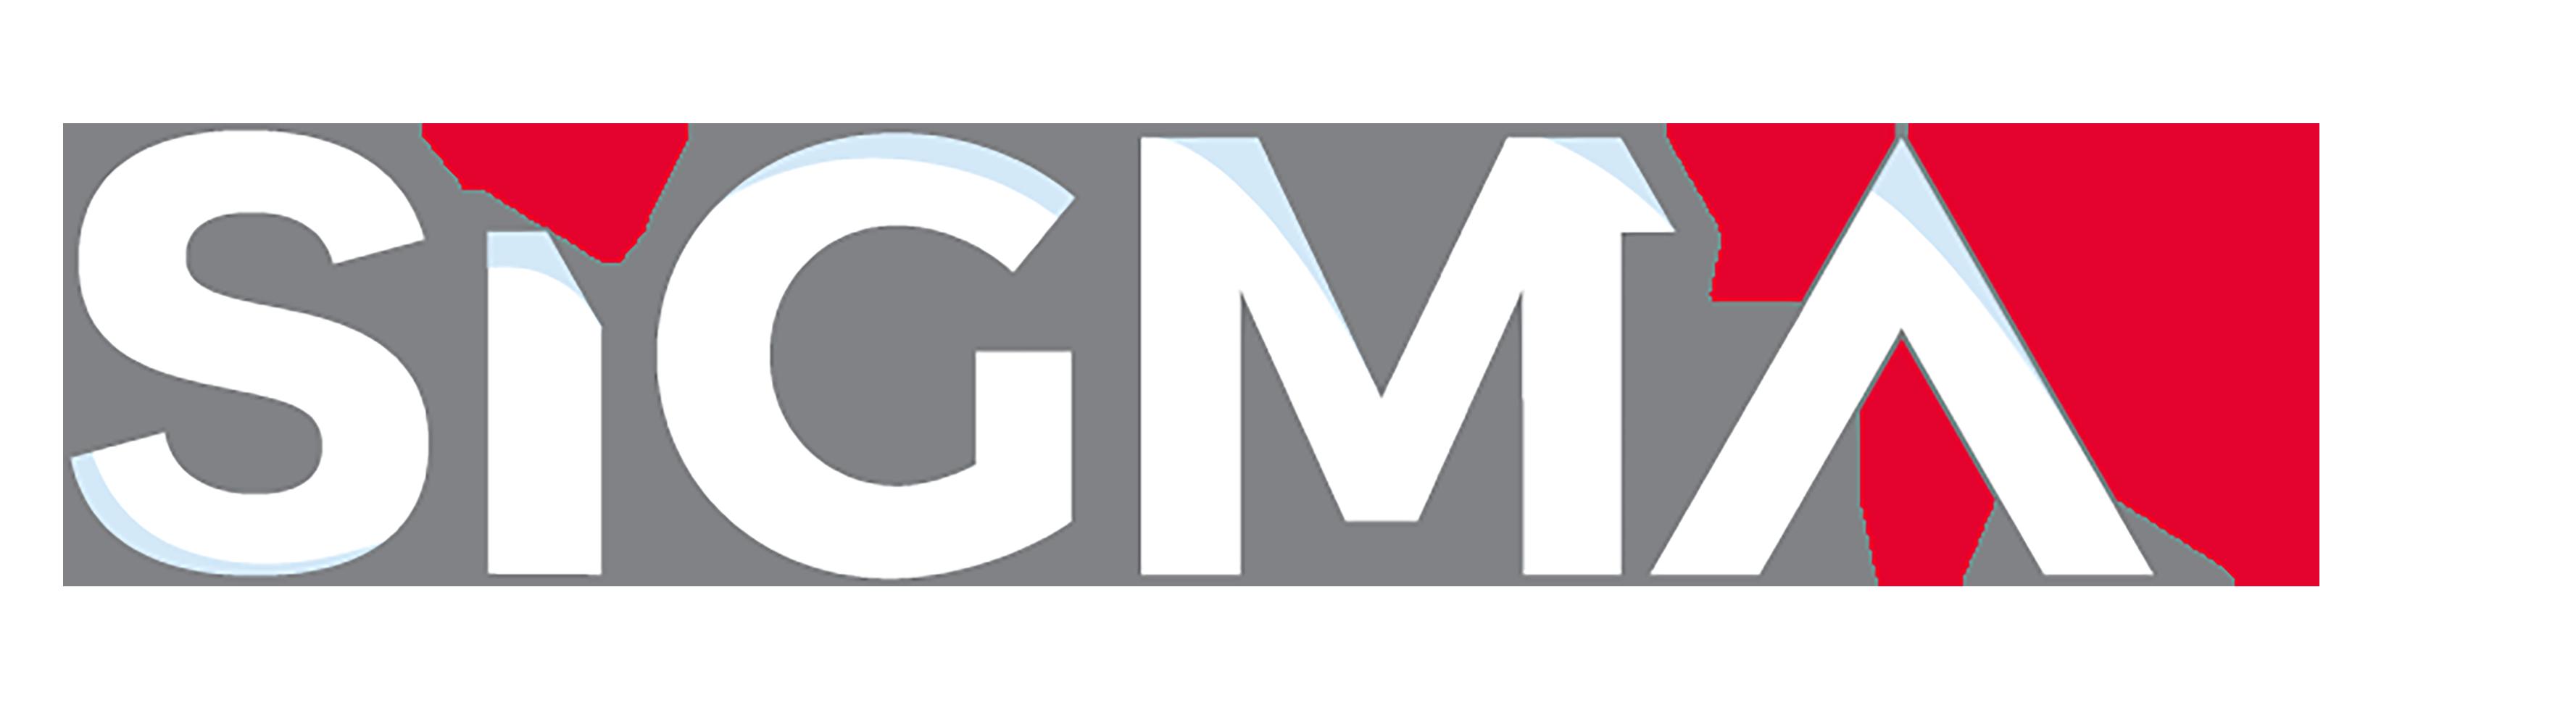 sigma-logo-horizontal-2